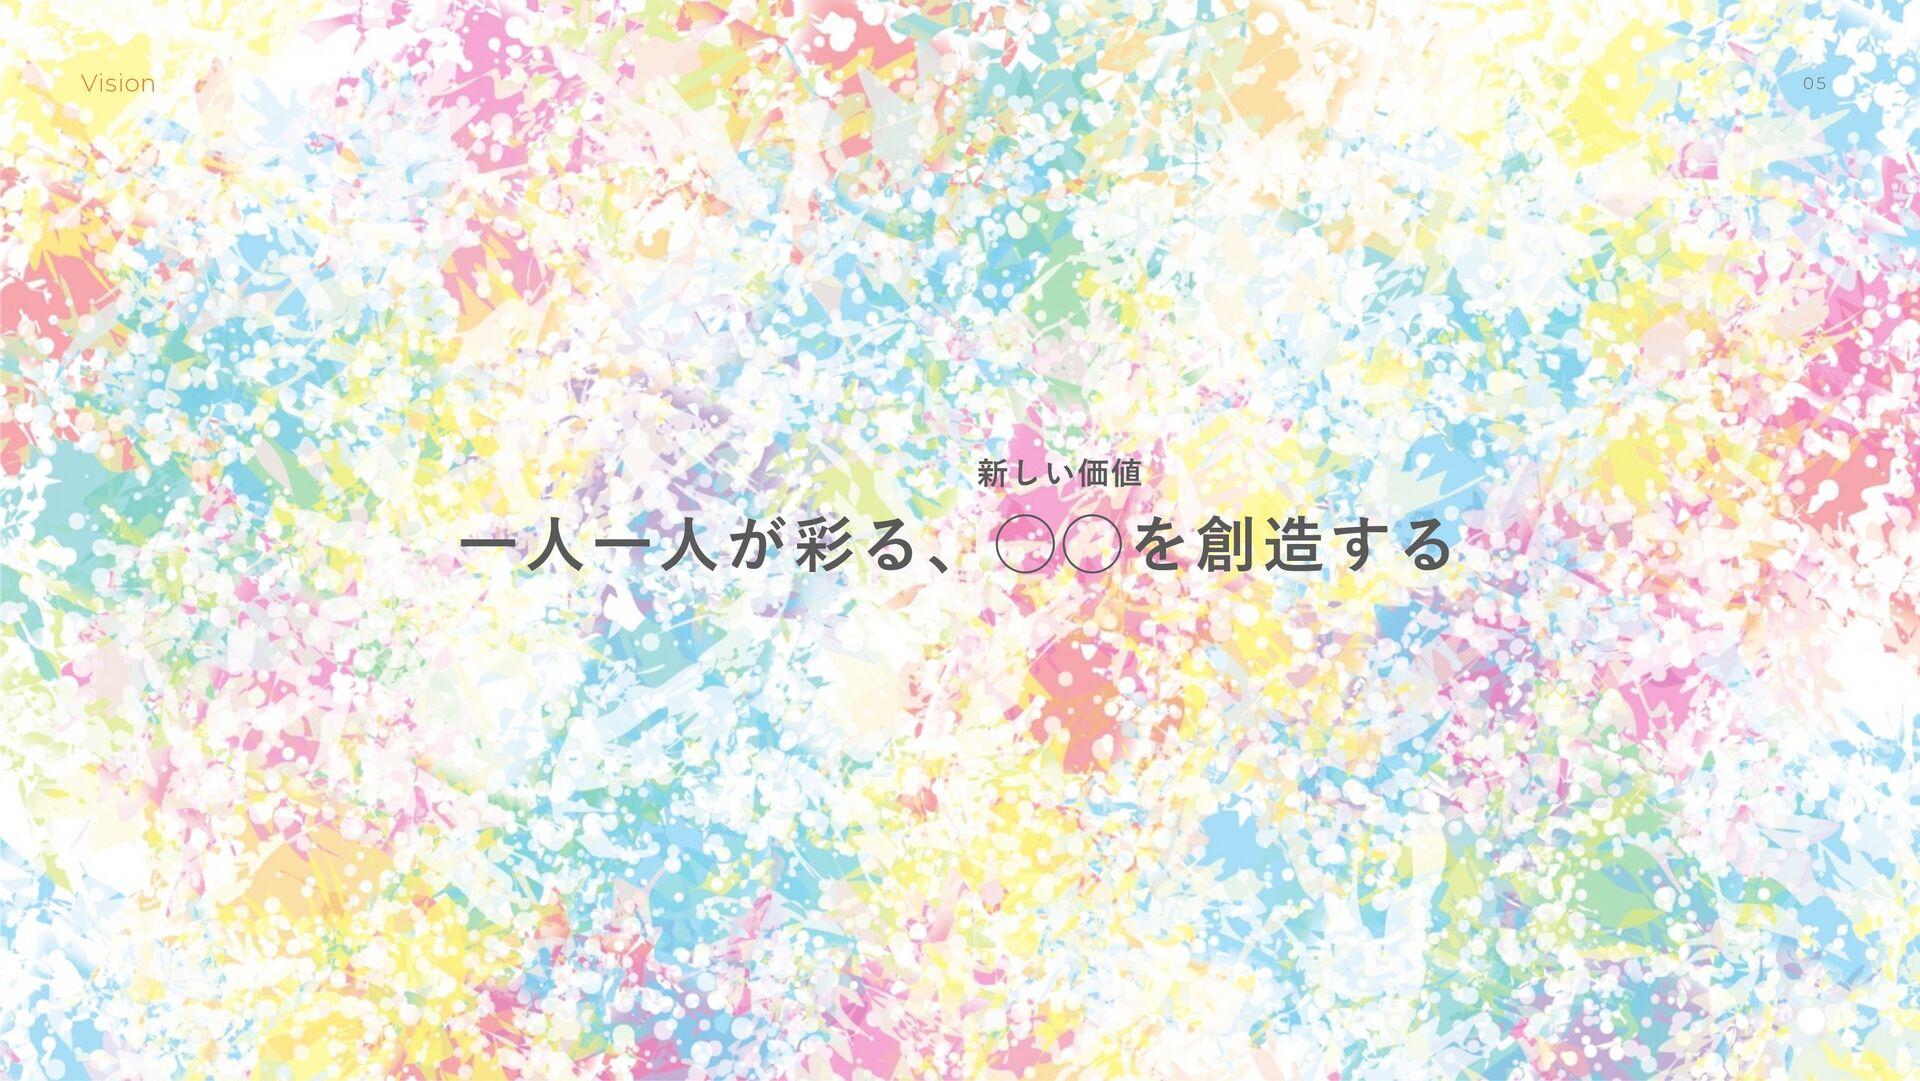 Vision 05 LIFE STYLE CREATE COMPANY 私たちが⽬指す世界 ラ...